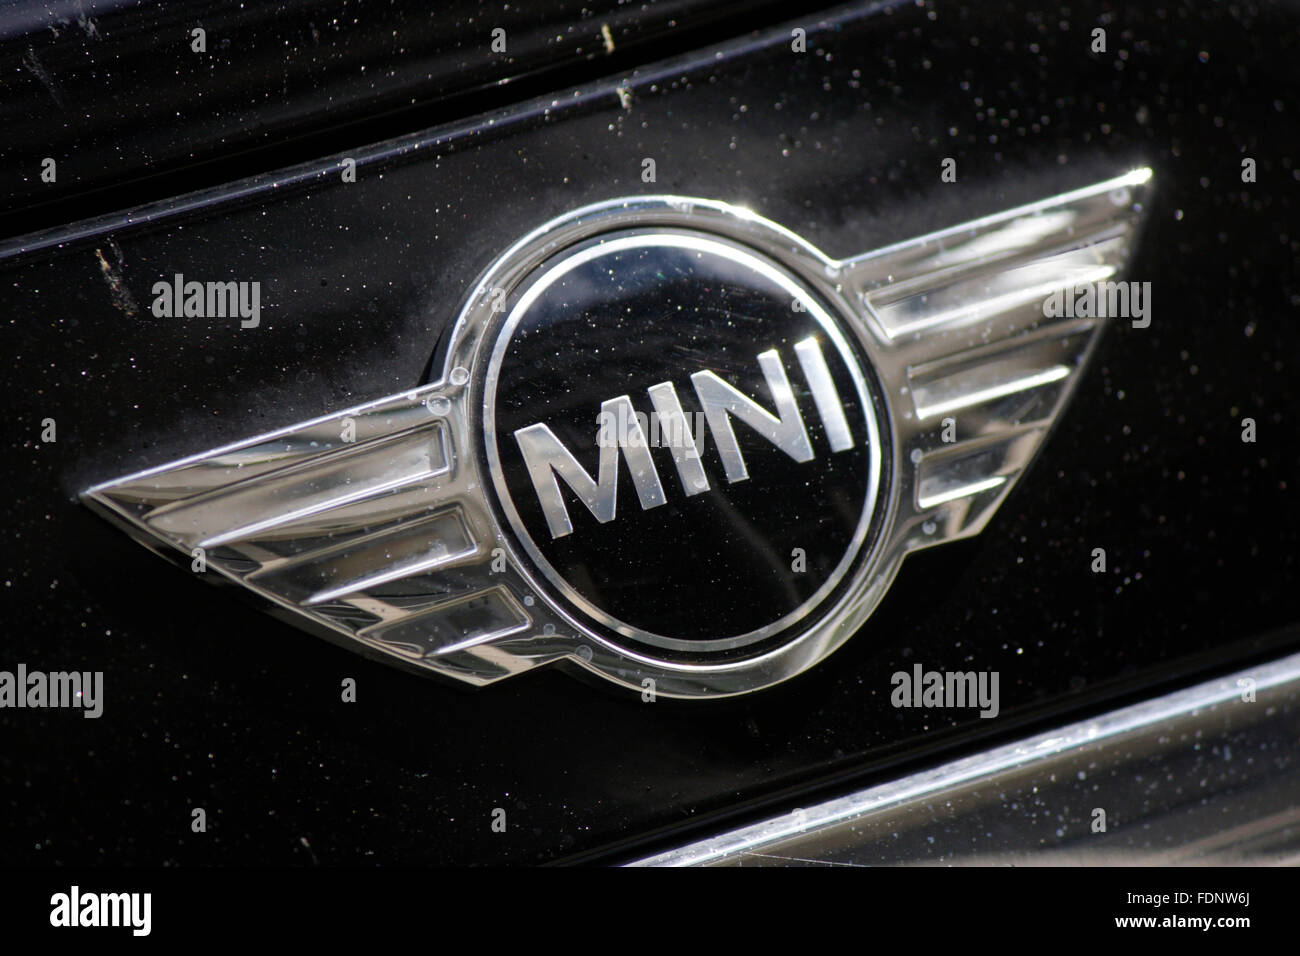 Markenname: 'Mini', Berlin. Photo Stock